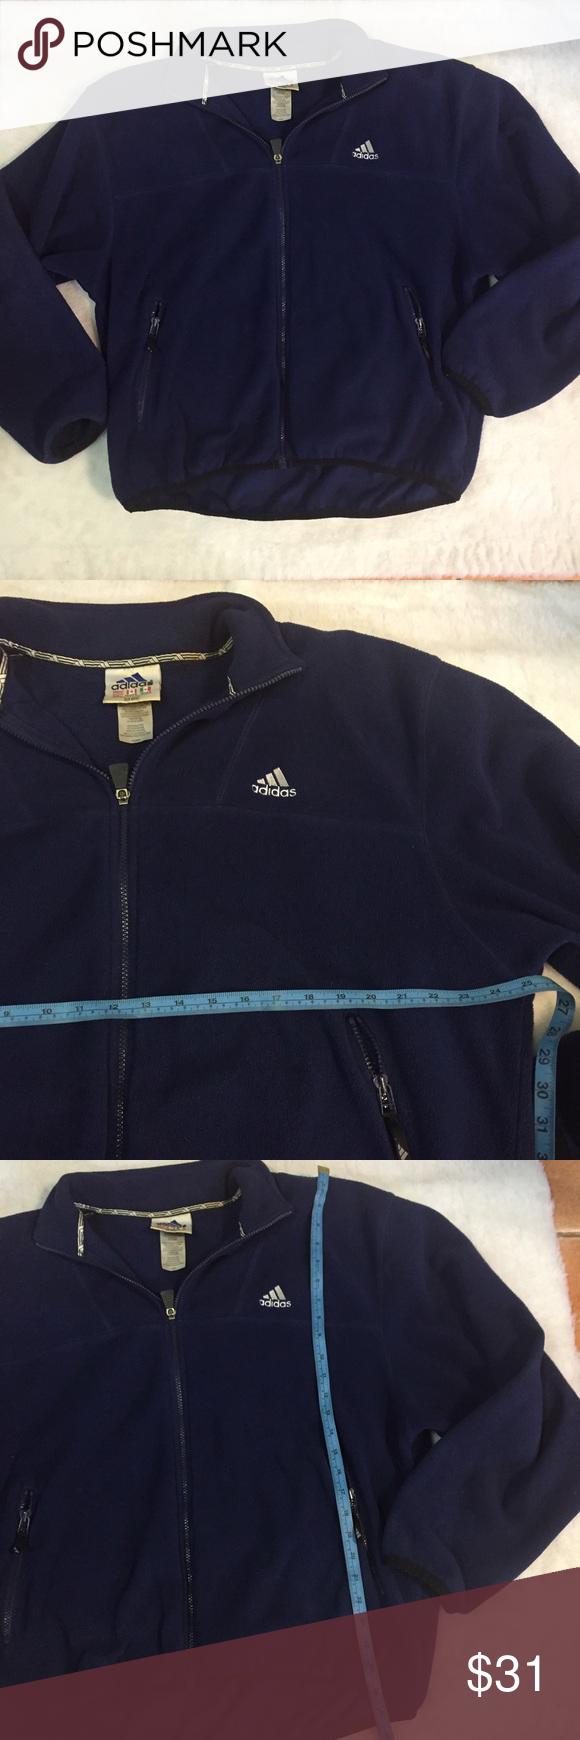 Vtg adidas menus large navy blue fleece jacket great condition will